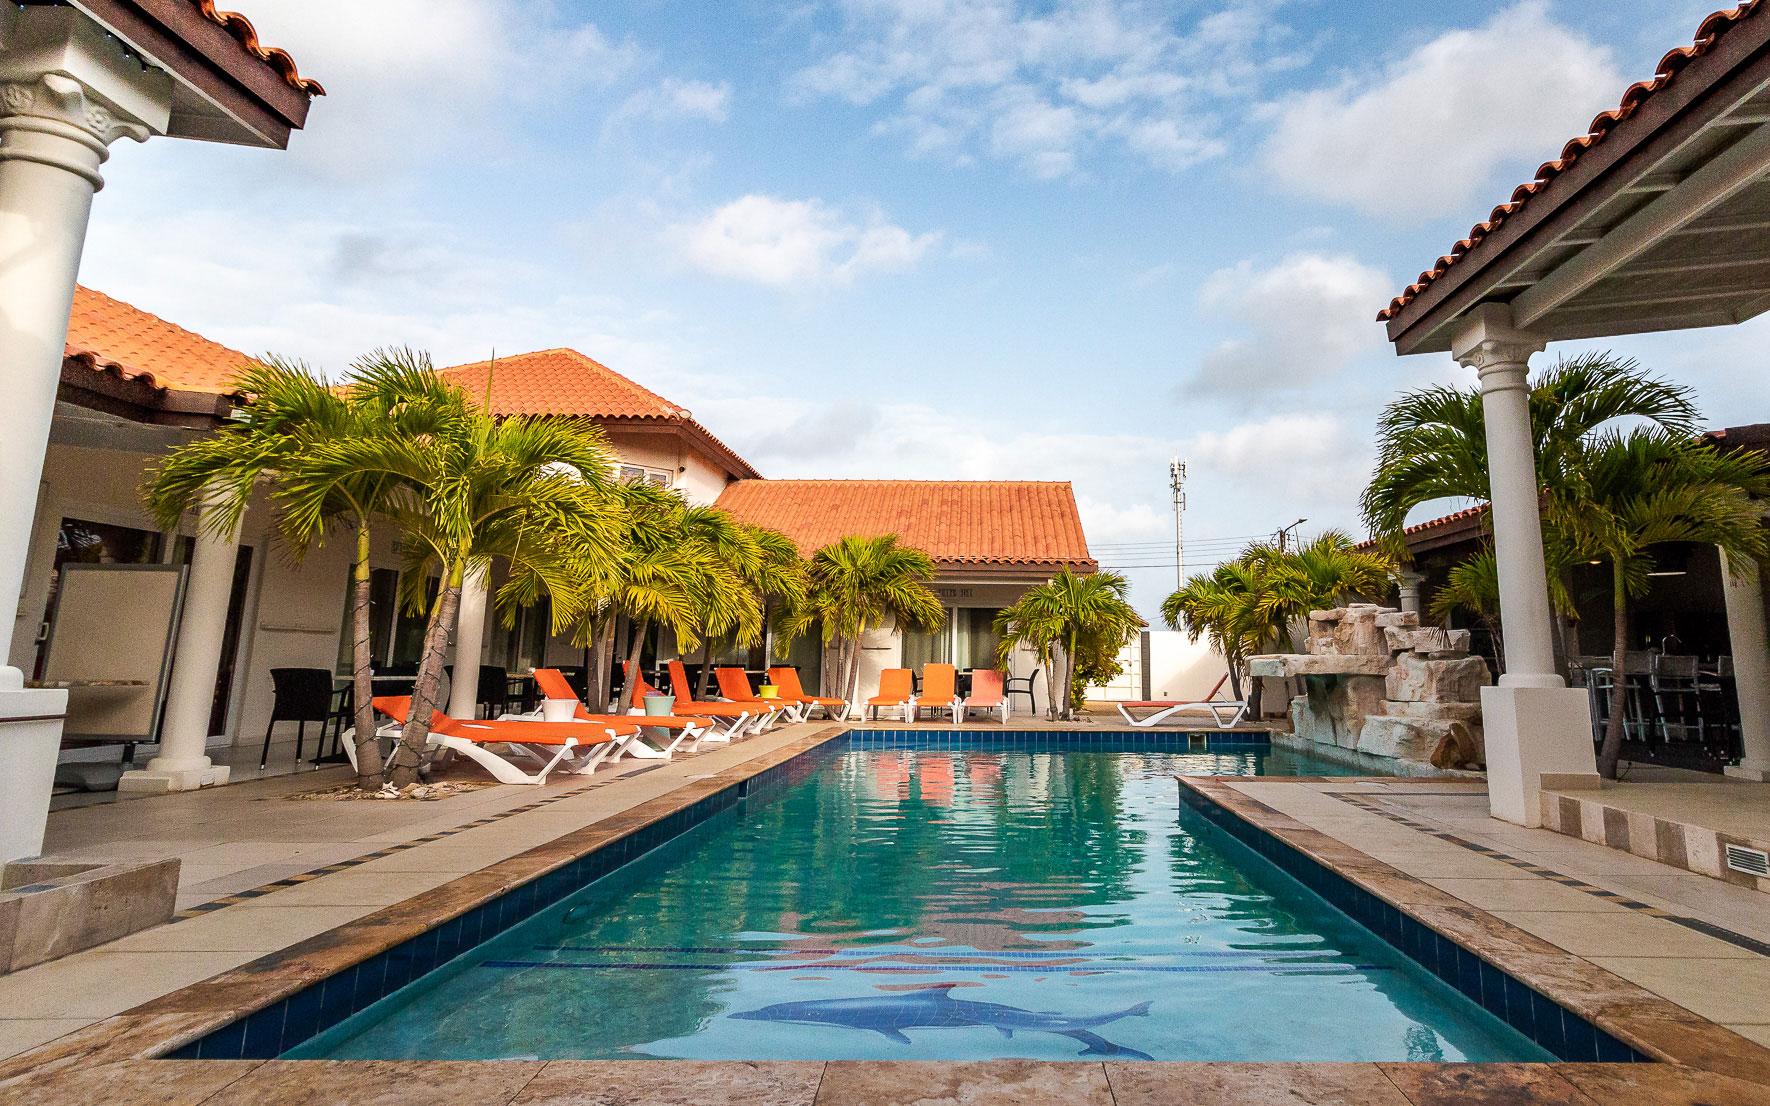 Swiss Paradise Villas, Aruba